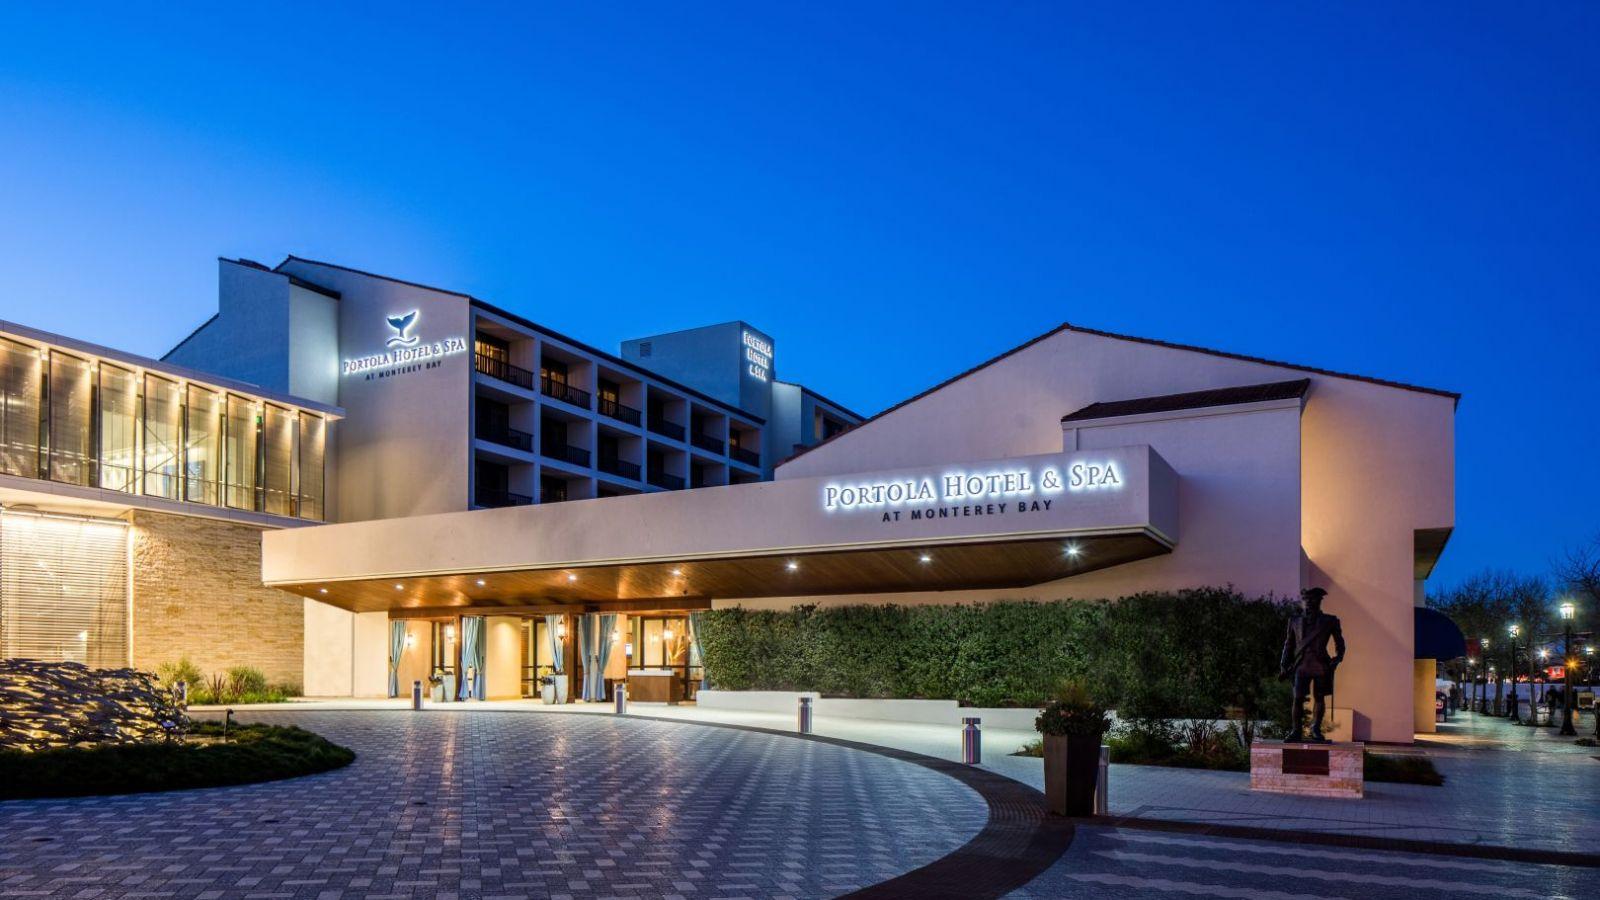 Portola Hotel and Spa